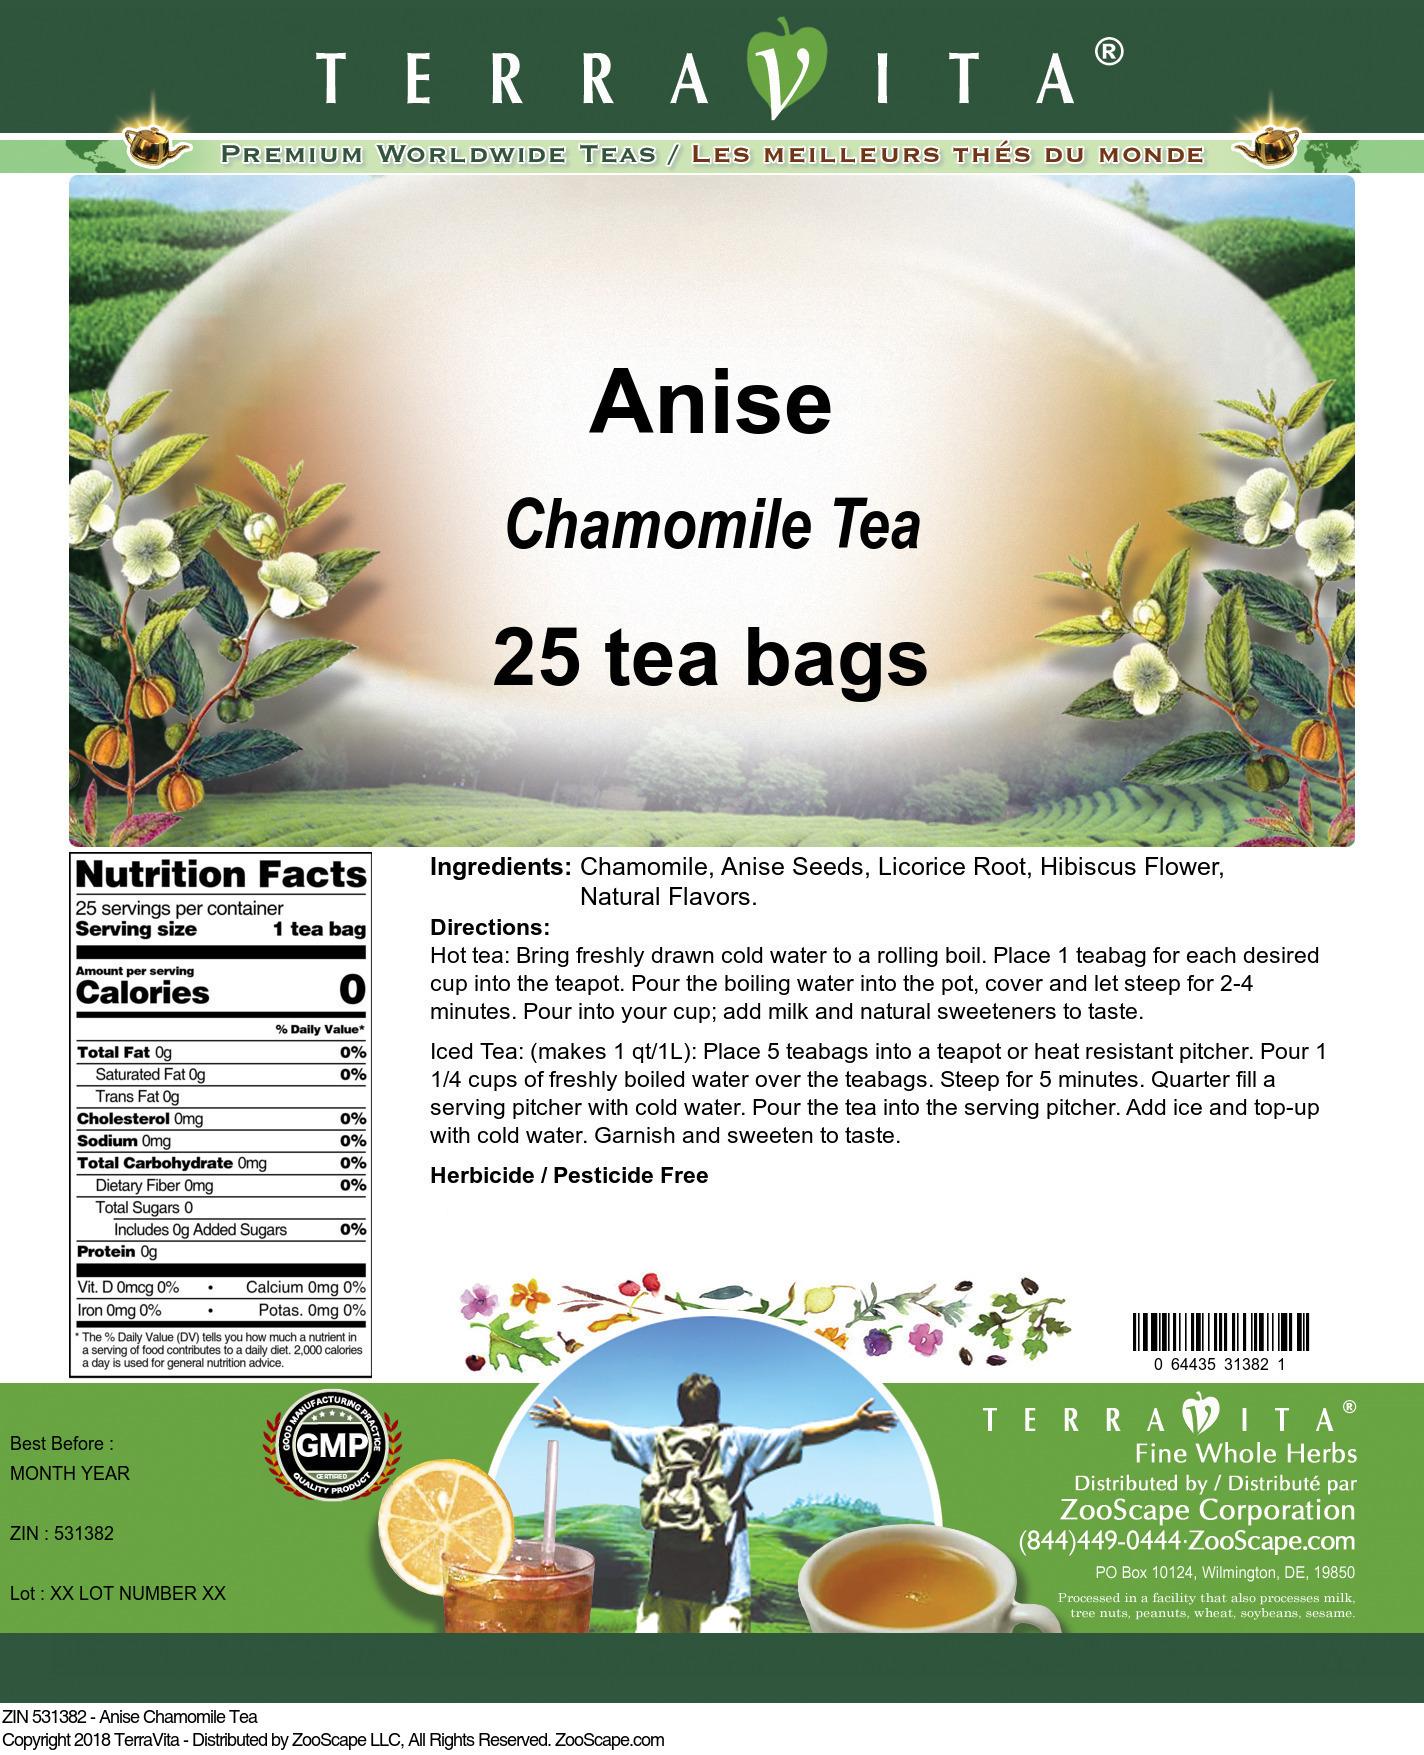 Anise Chamomile Tea